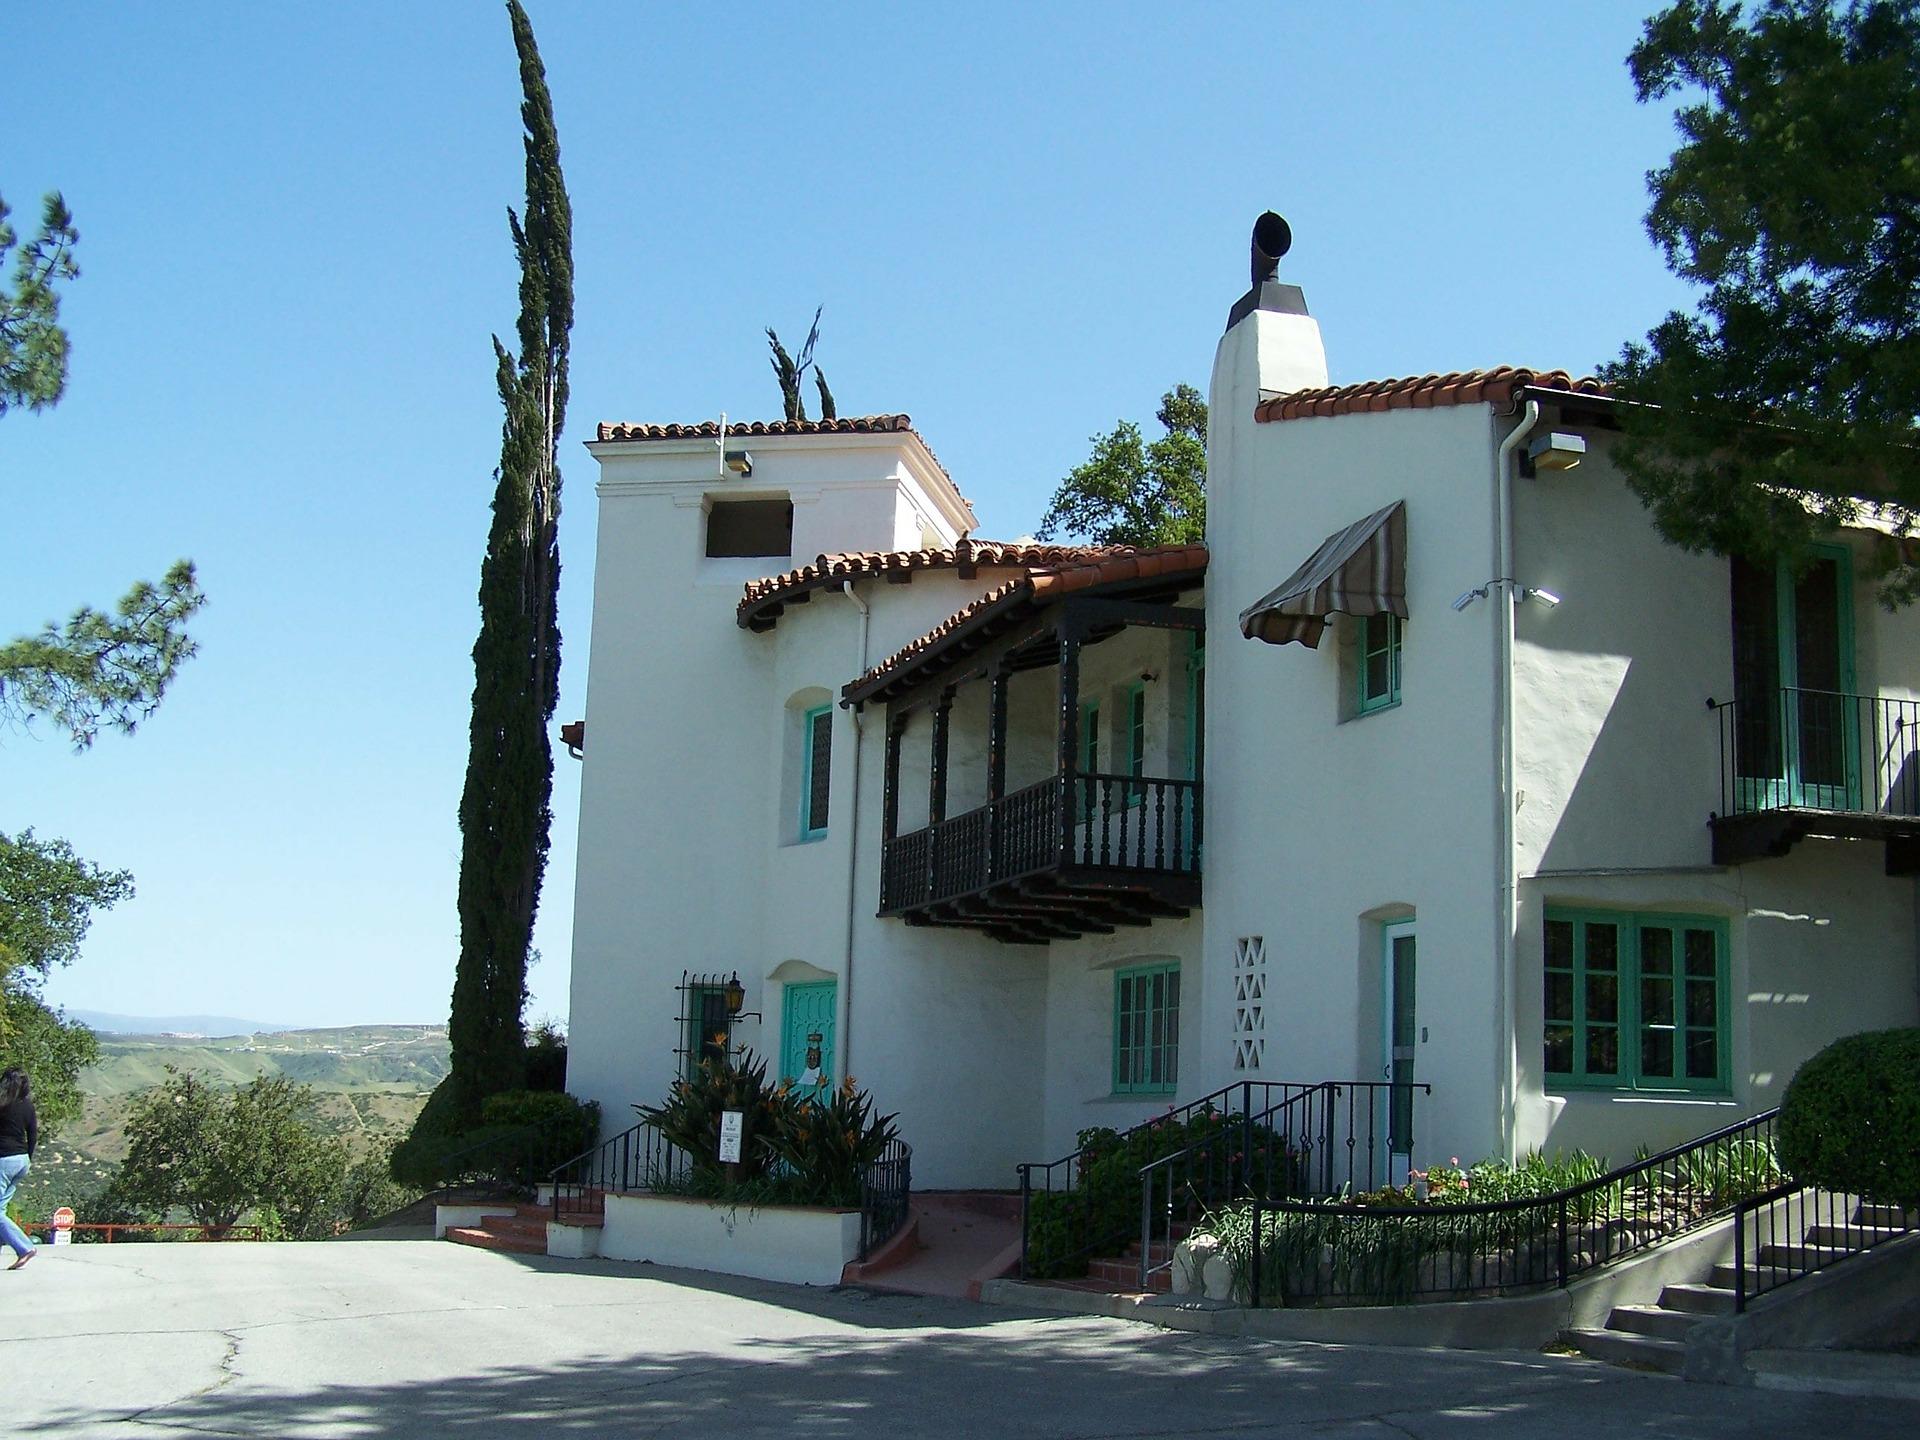 Et spansk hjem i bjergene